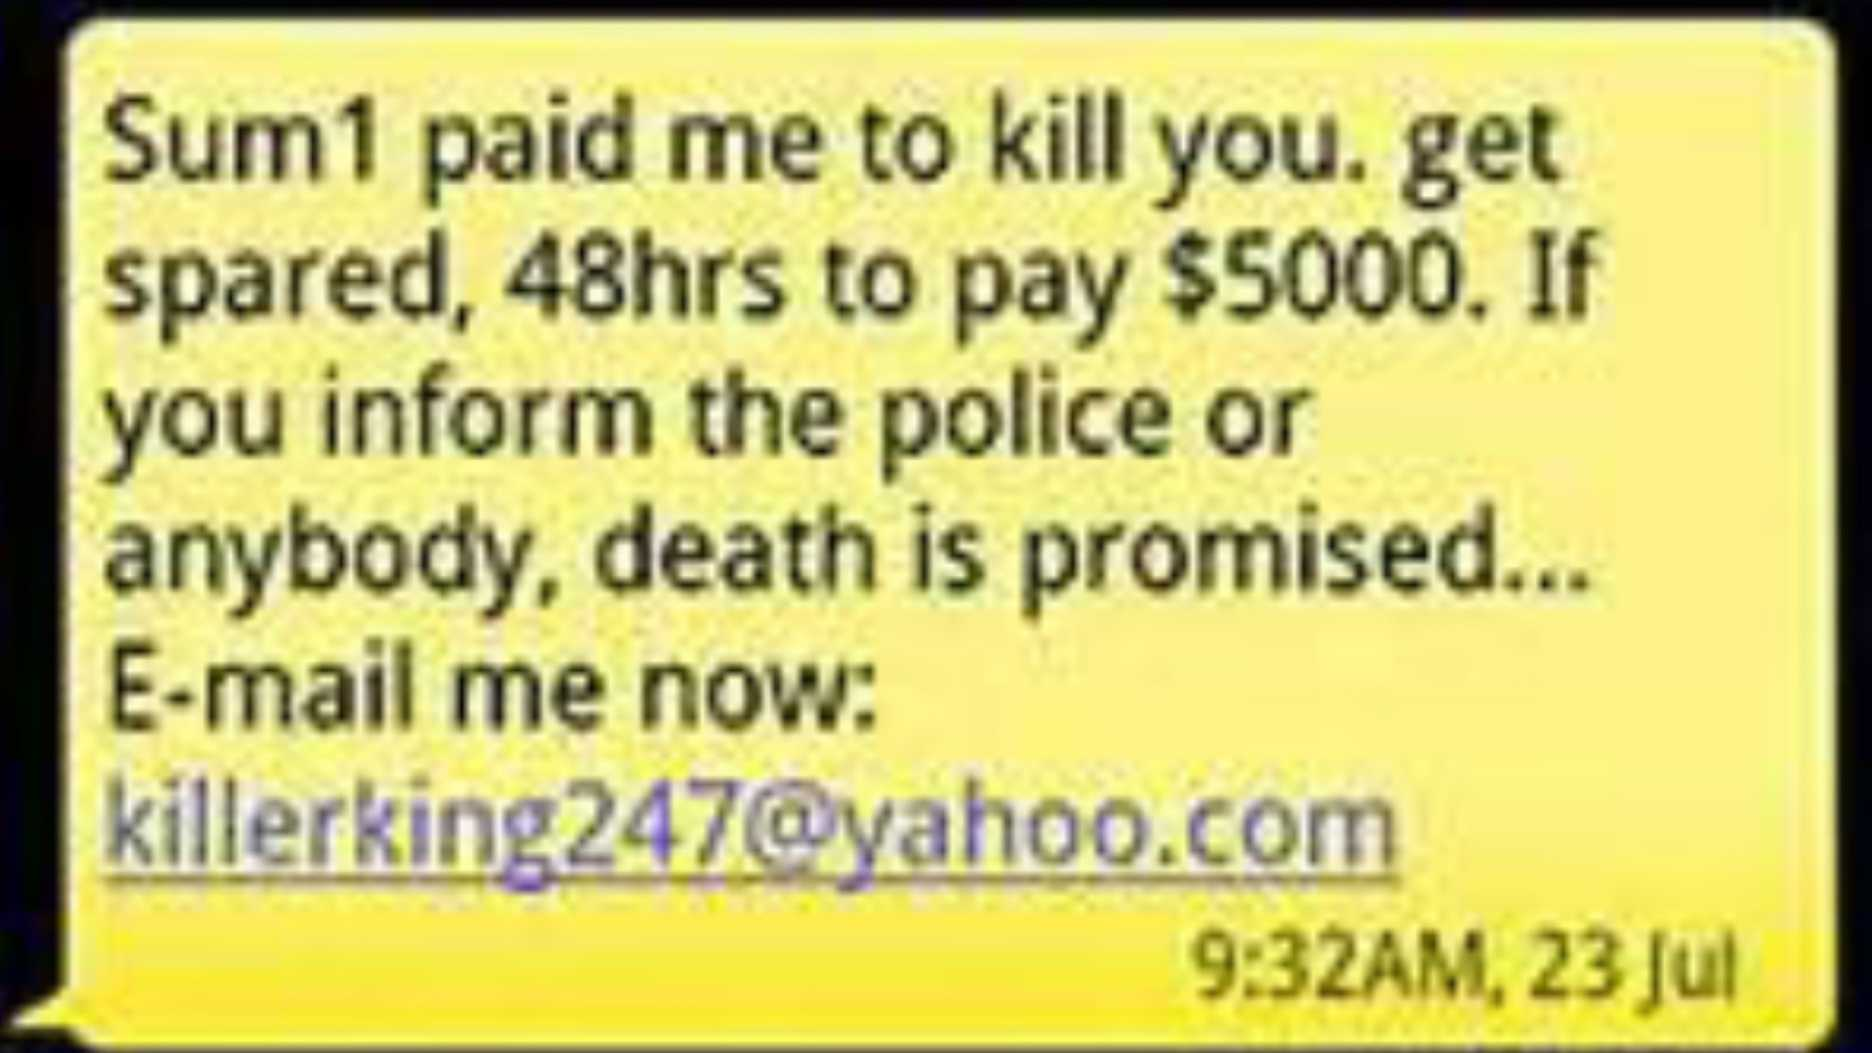 death threat scam pic.jpg